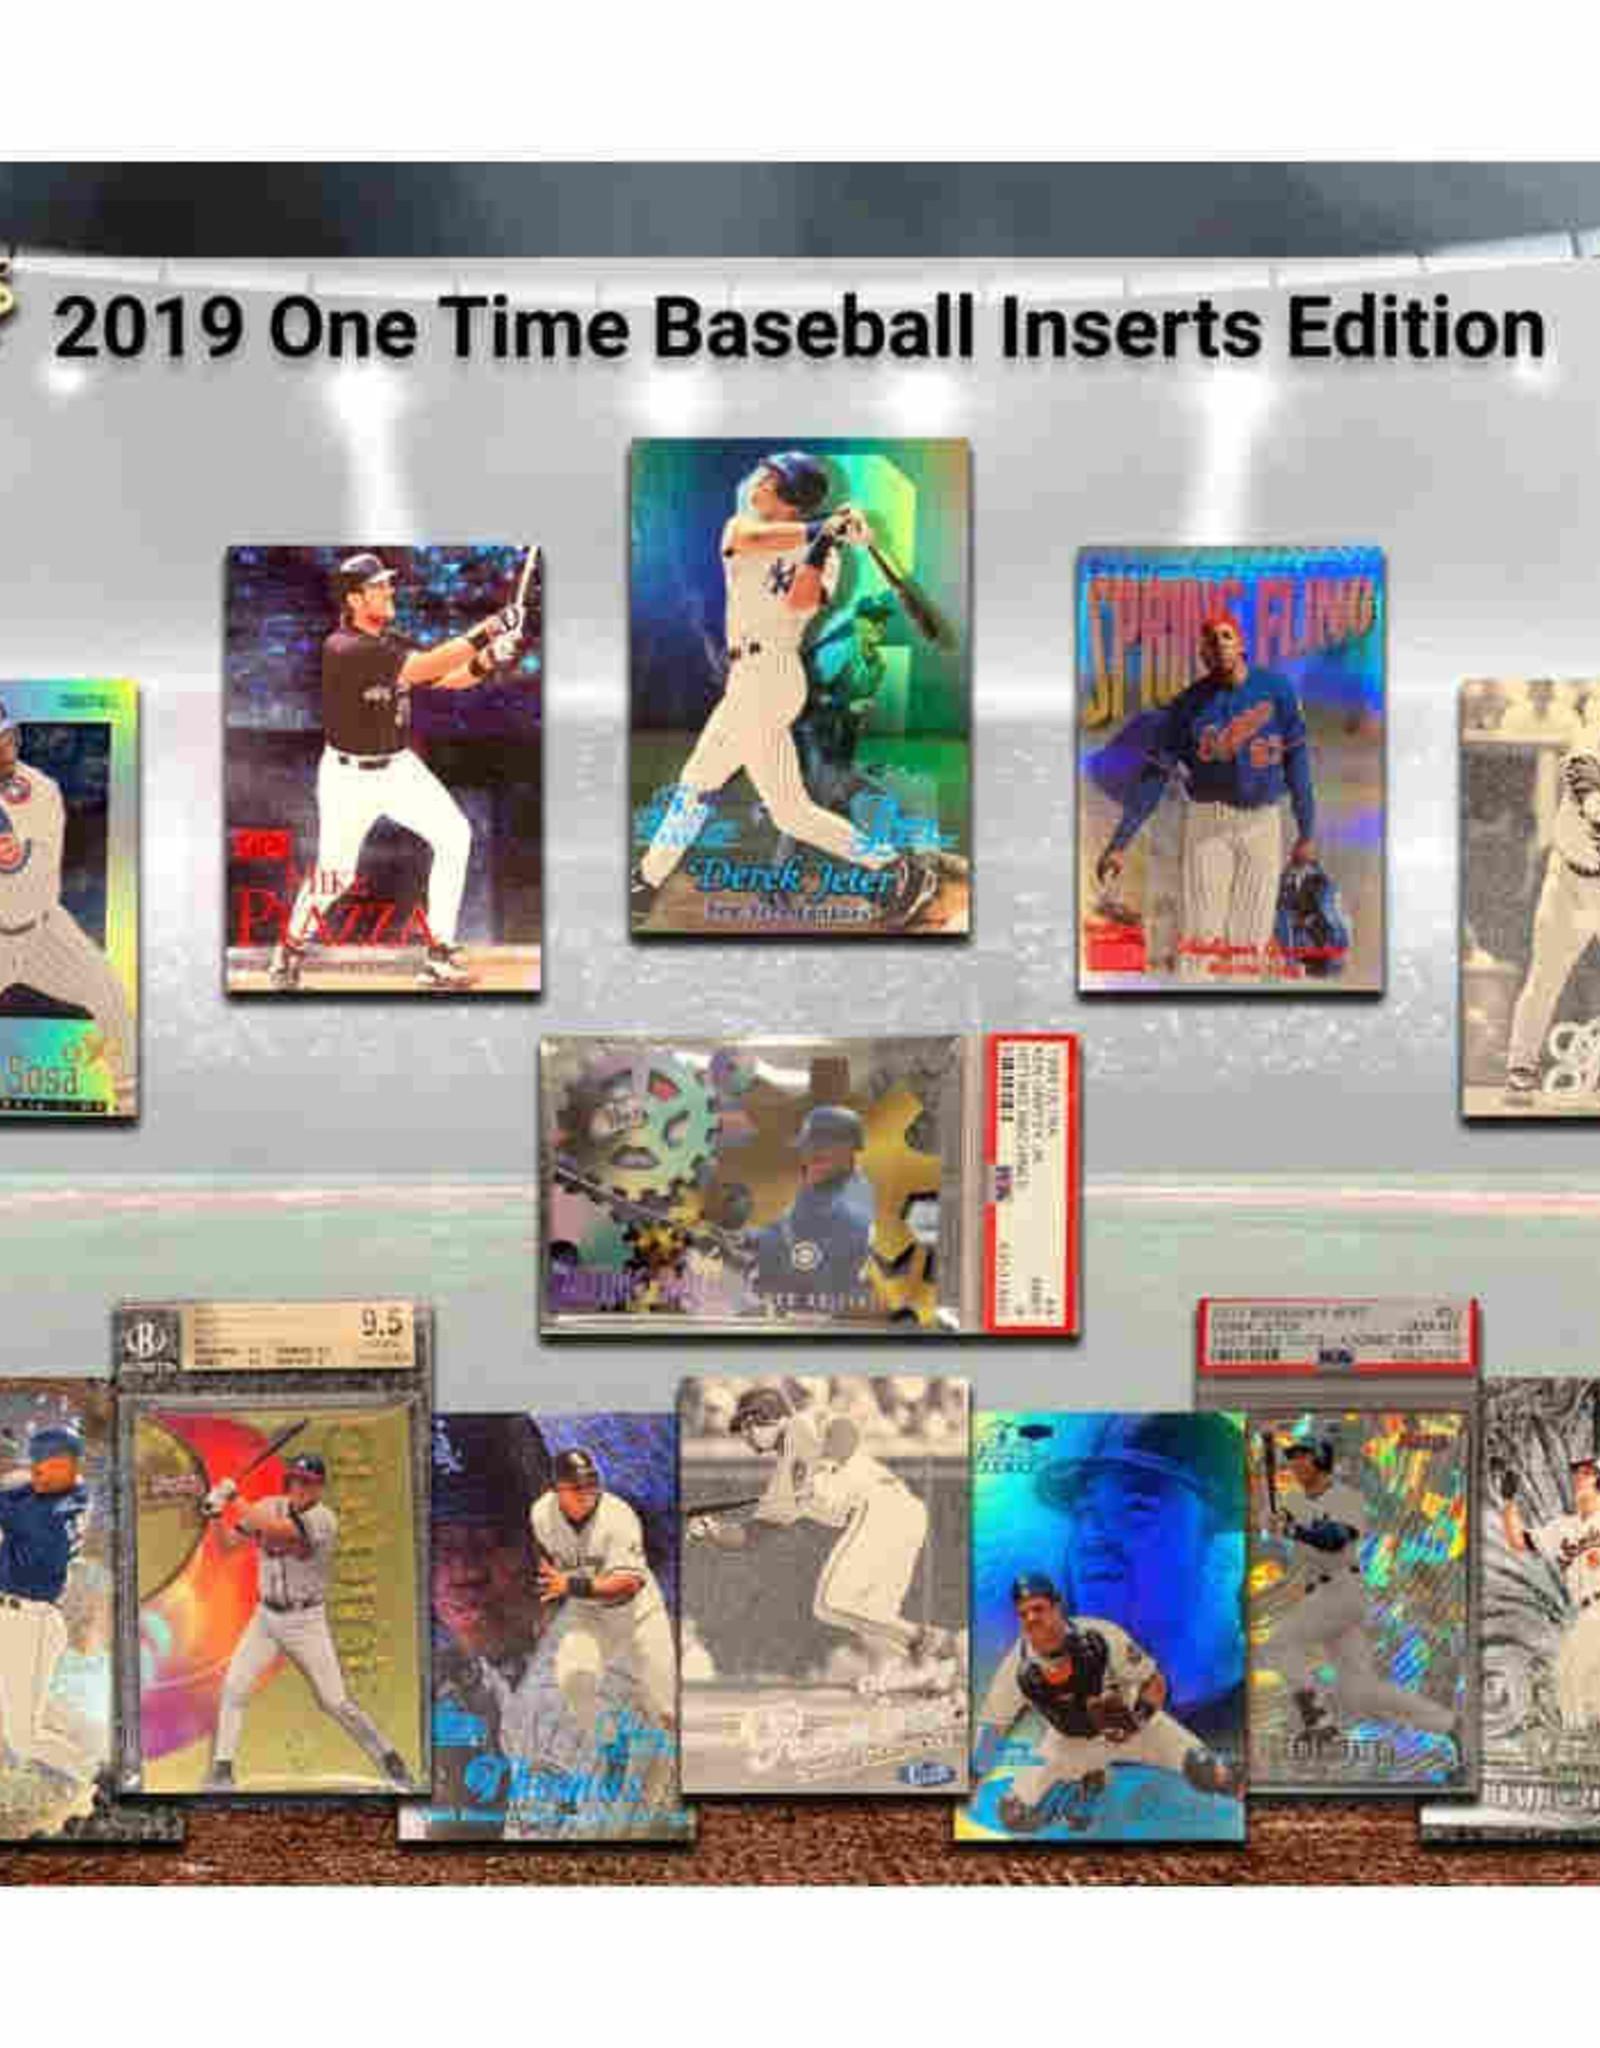 Super Break 2019 Super Break One Time Baseball Inserts Edition